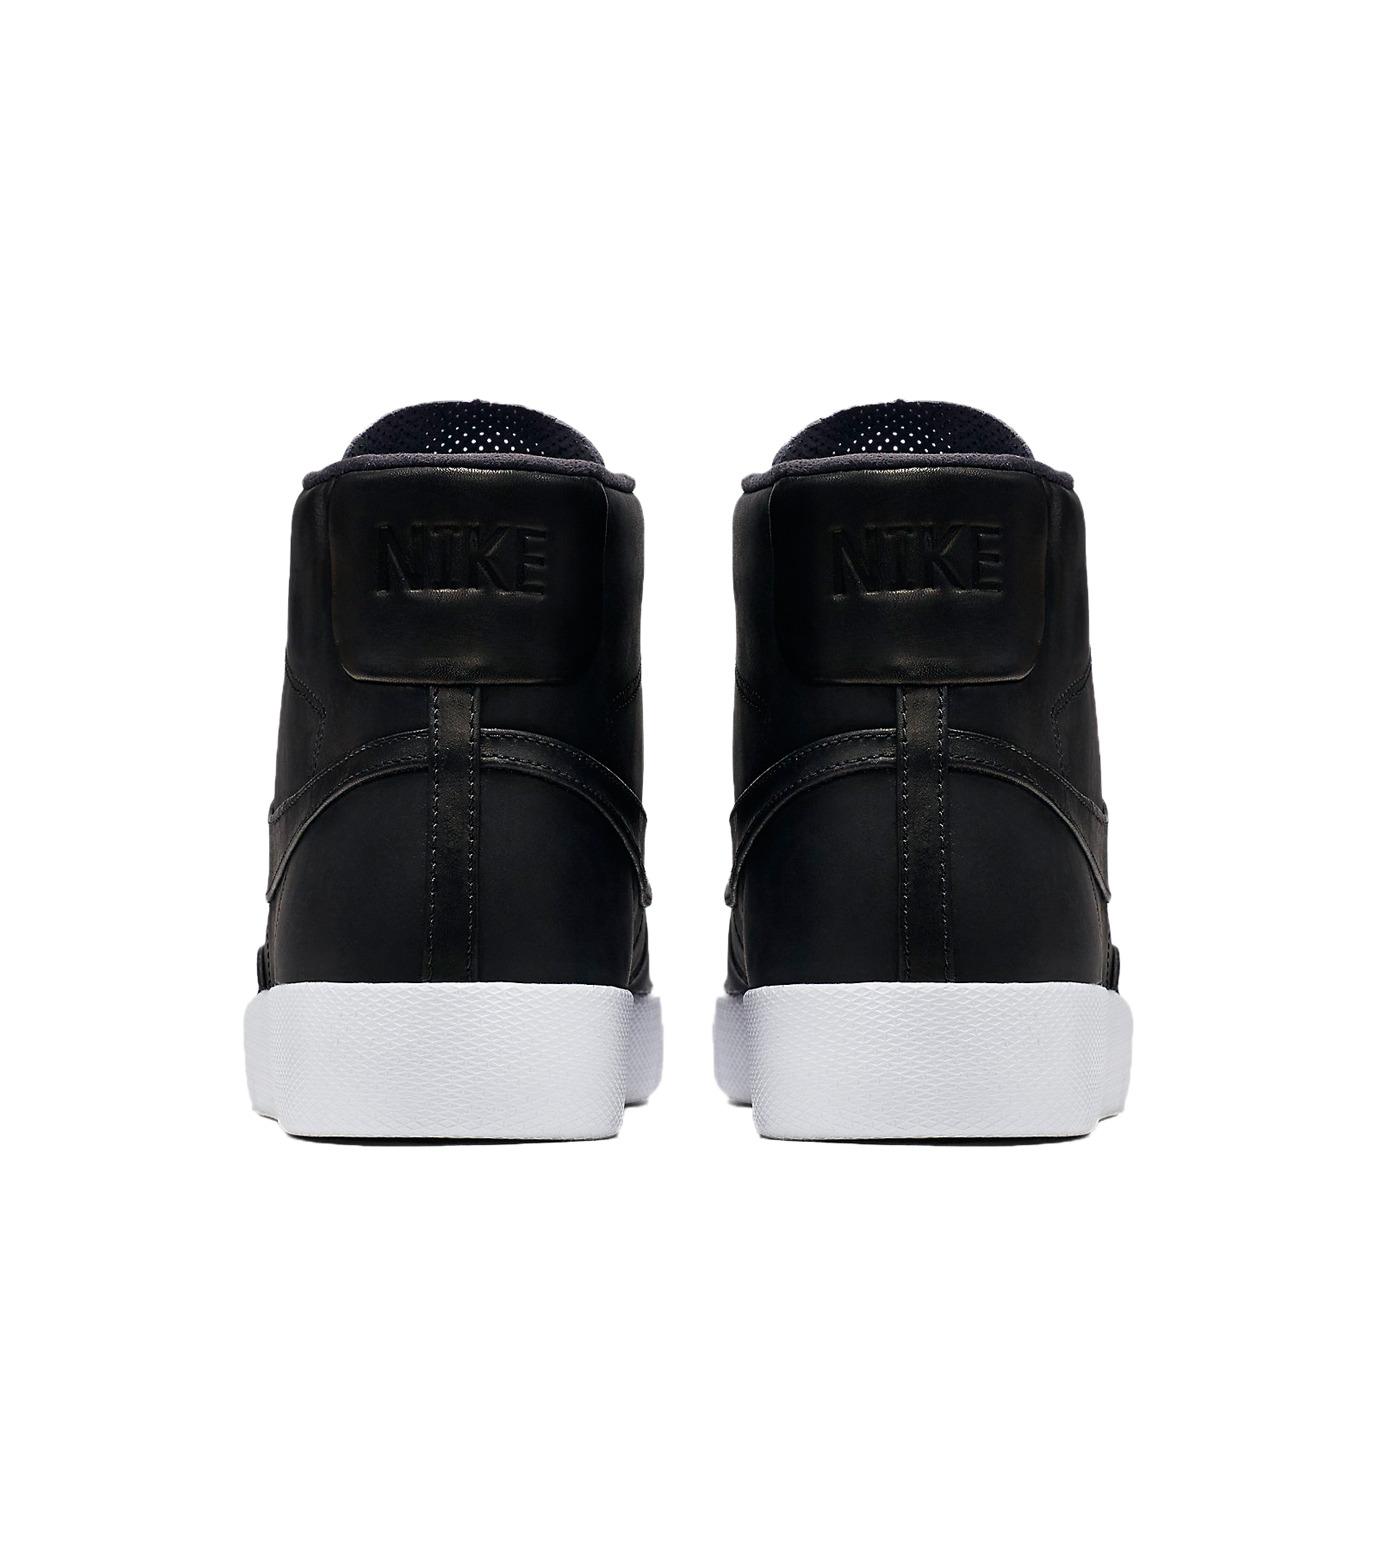 NIKE(ナイキ)のNIKELAB BLAZER ADVNCD-BLACK(シューズ/shoes)-874775-001-13 拡大詳細画像5